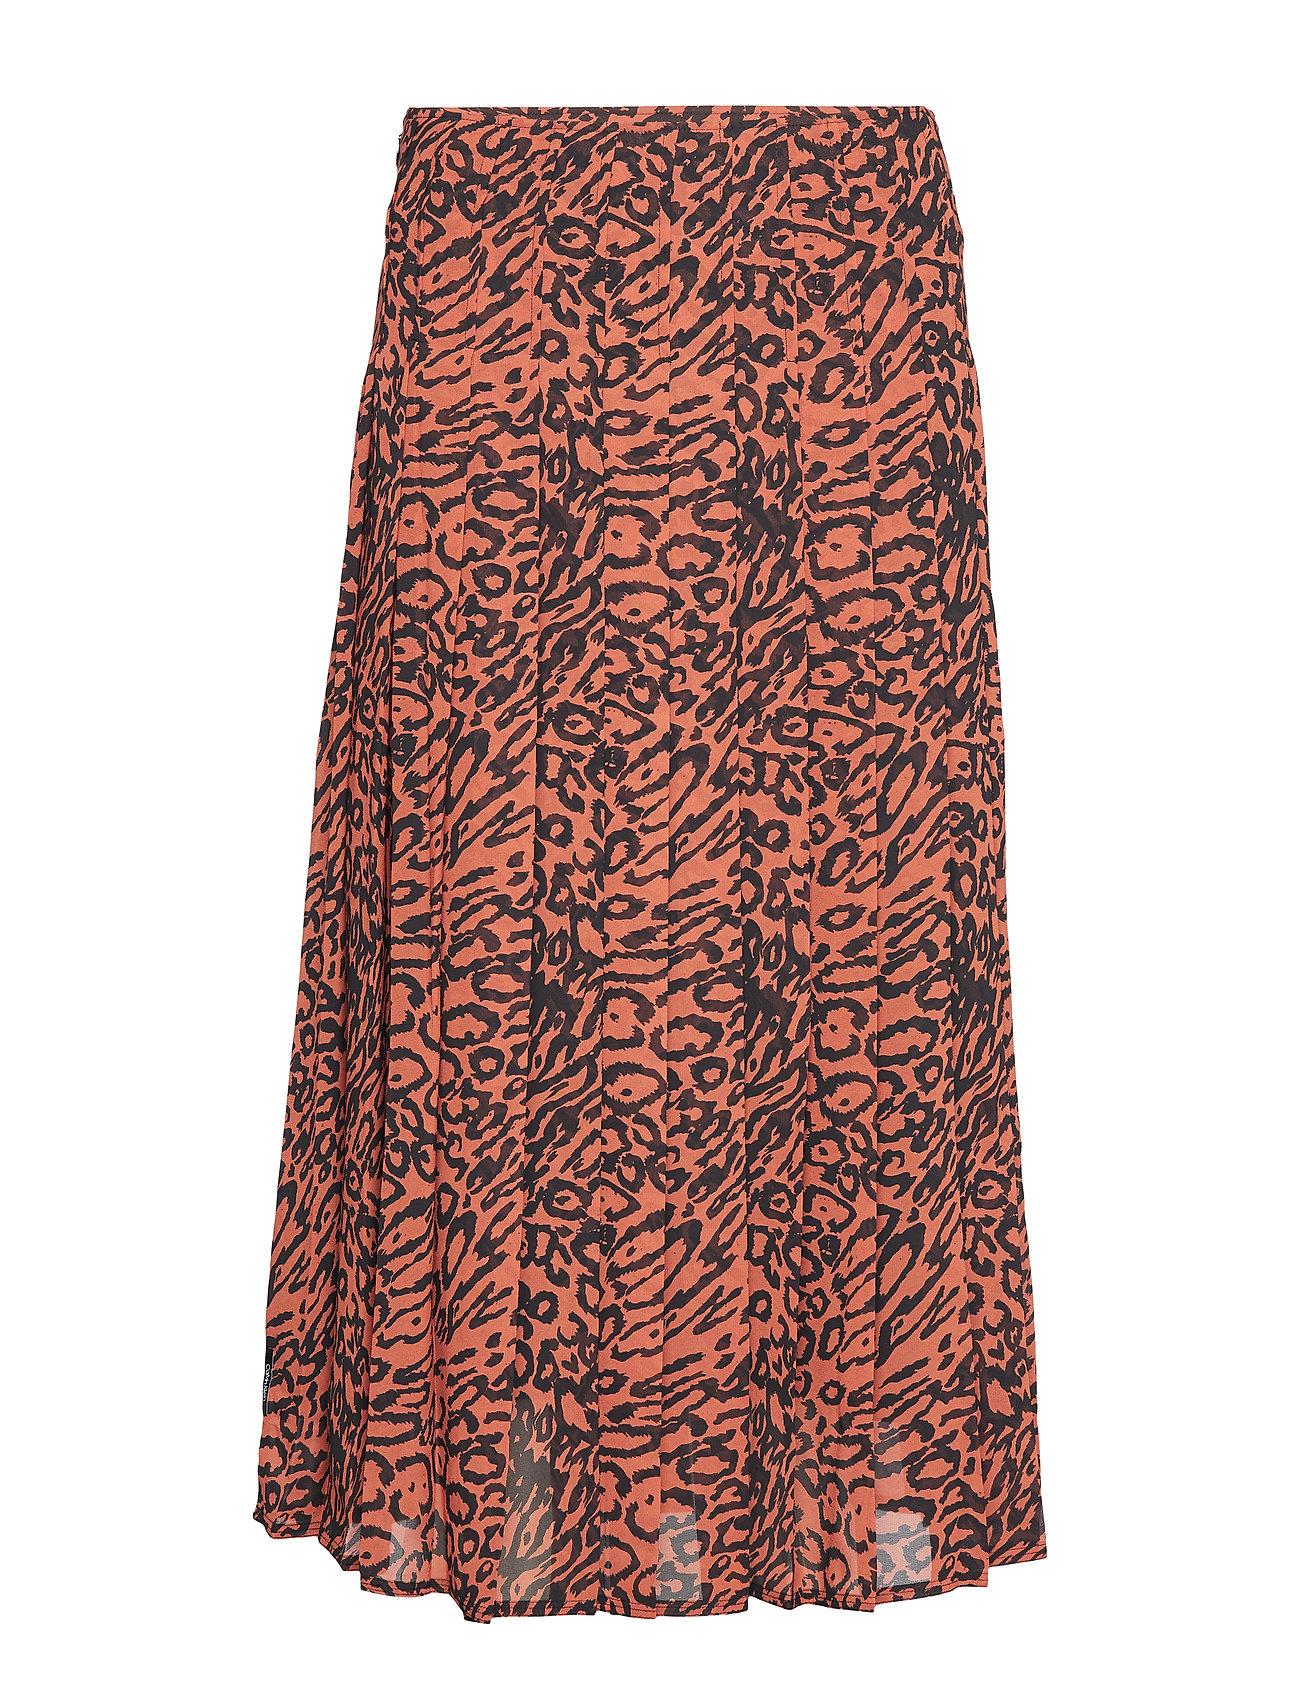 Leopard Klein Georgette PleopardBrownCalvin Leopard Georgette LSpjGMUzqV